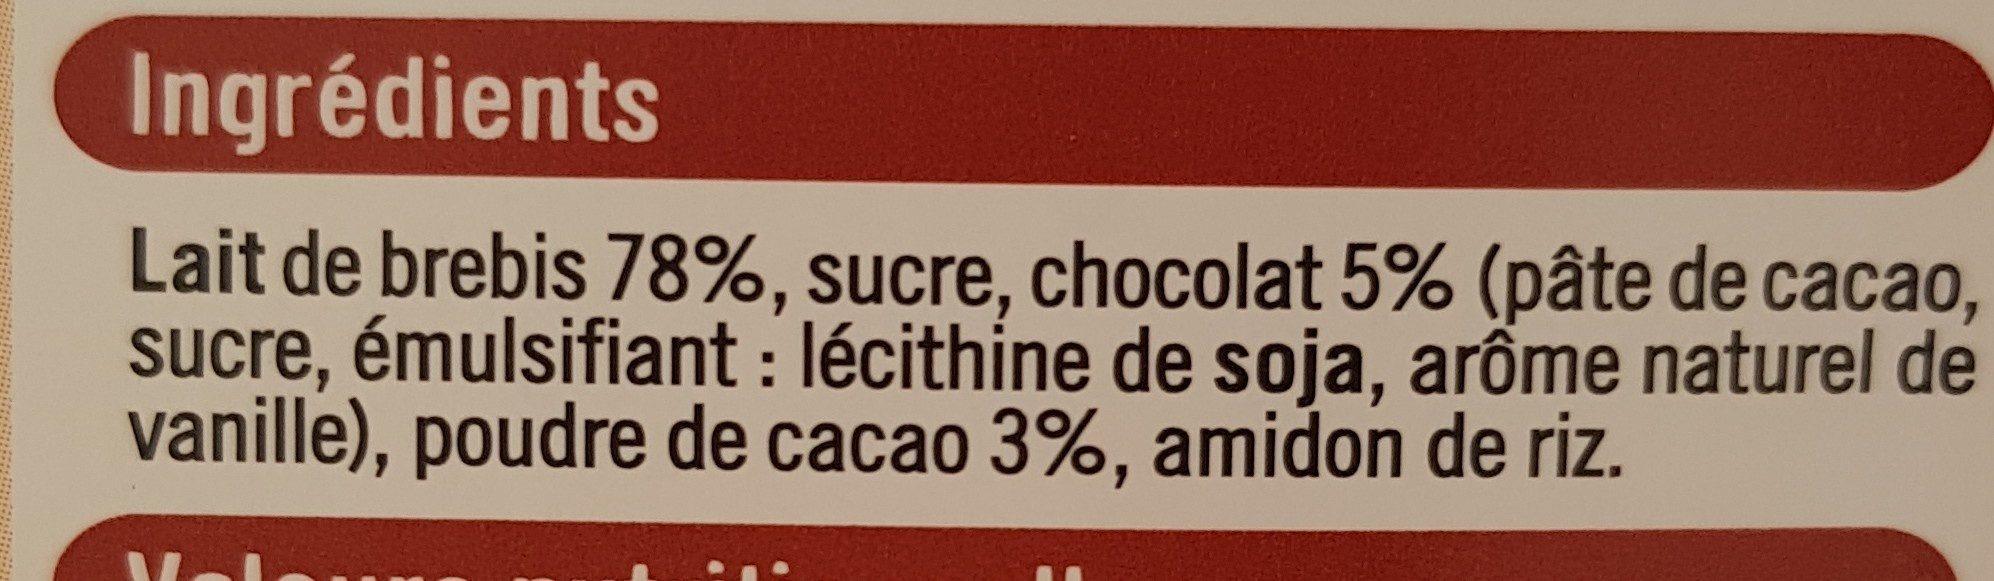 Crème dessert au chocolat - Ingredients